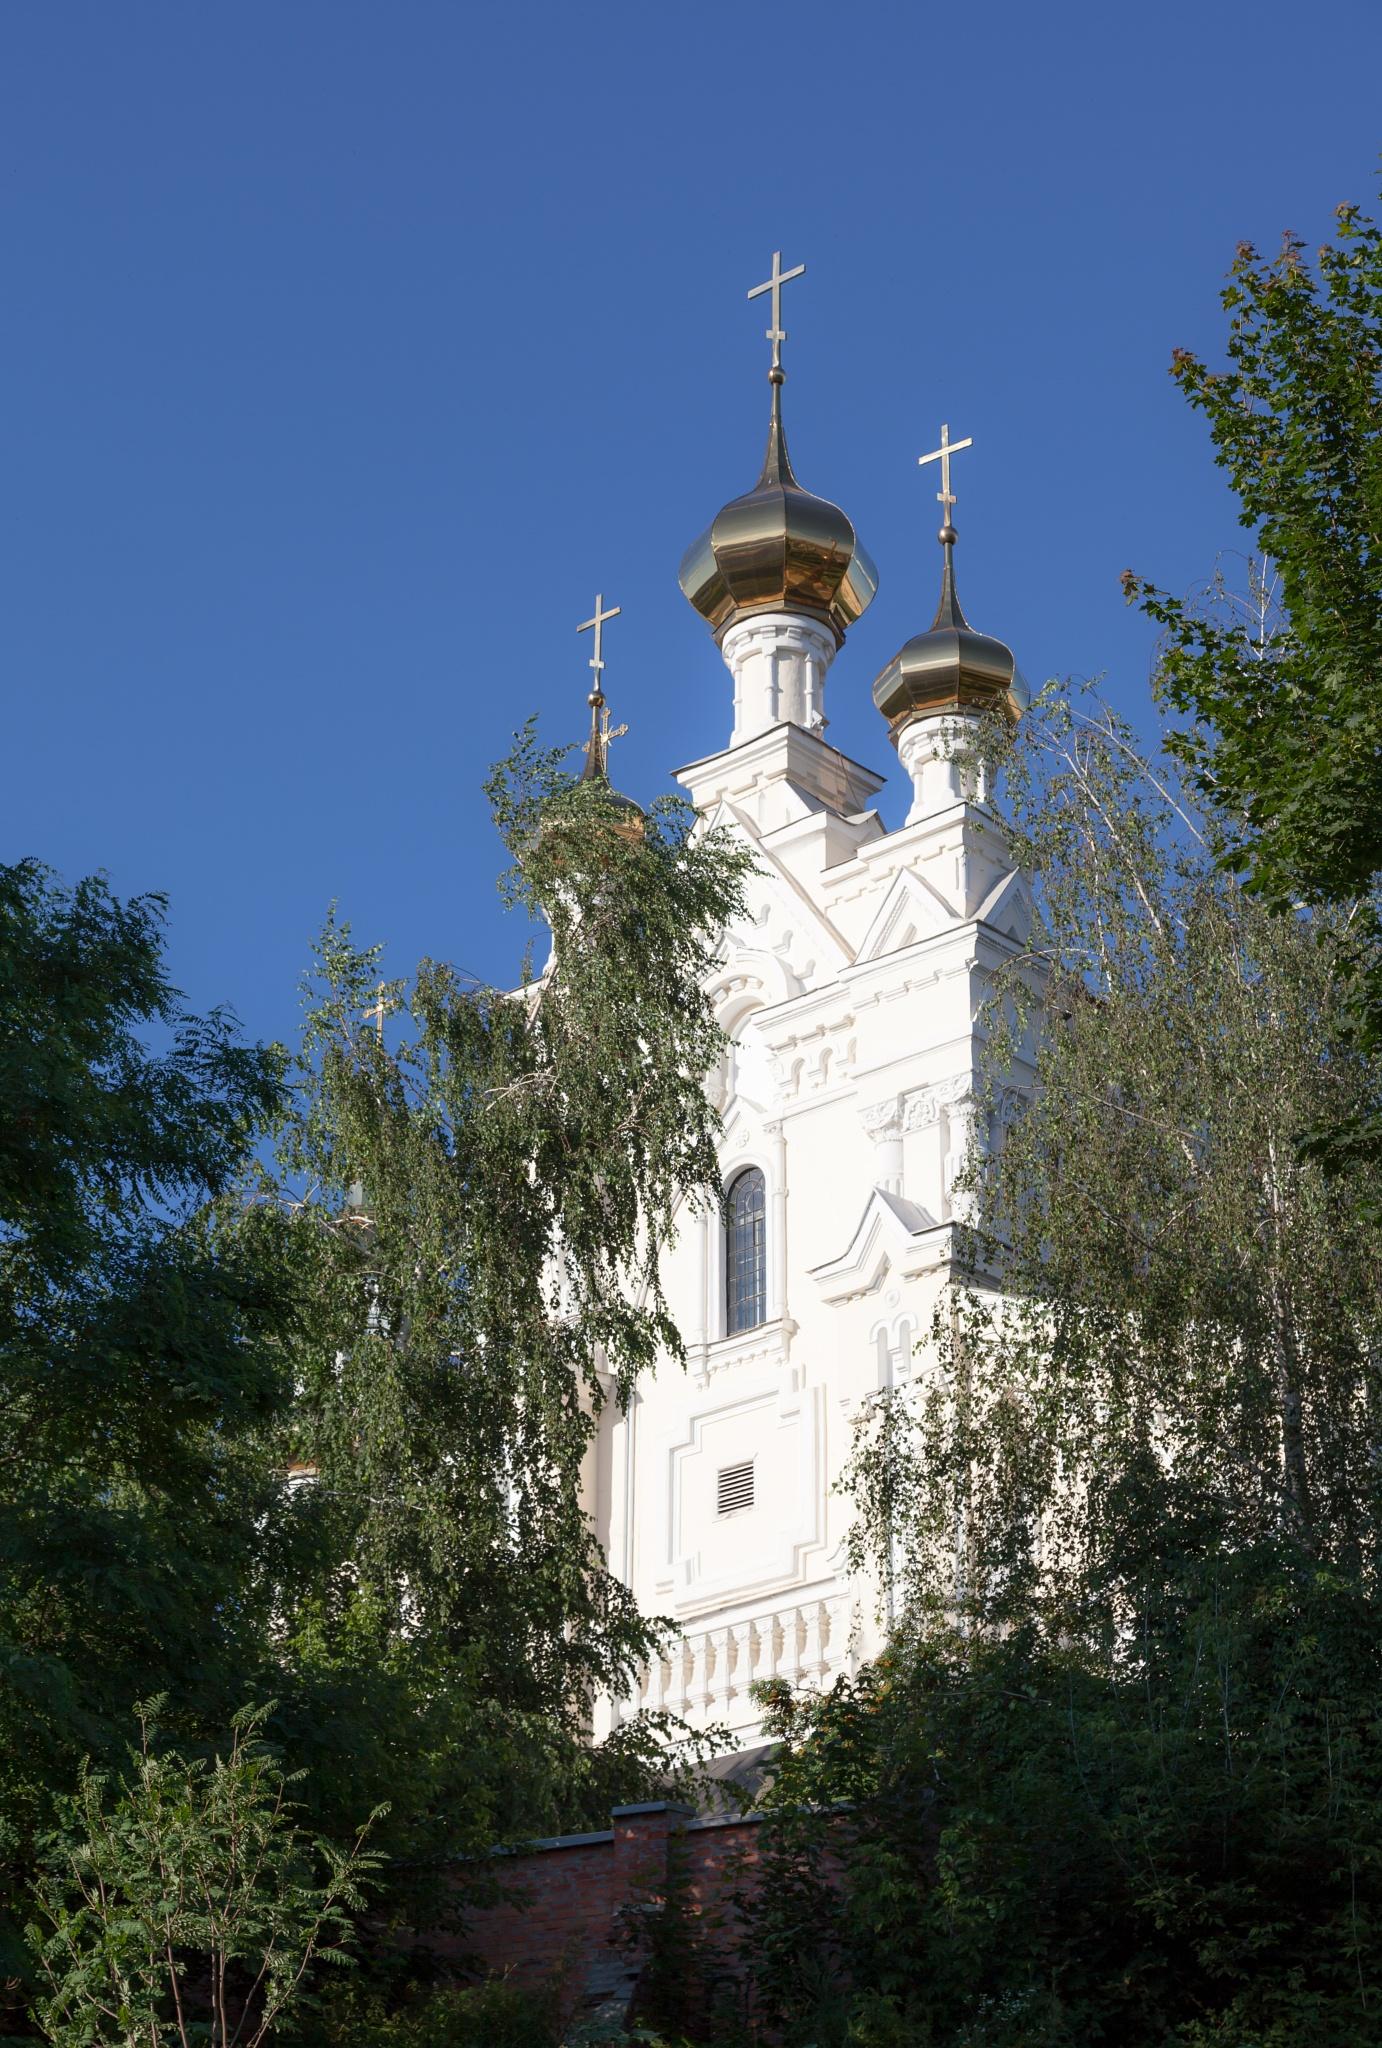 A Temple in Kharkov by Mikhail Minakov